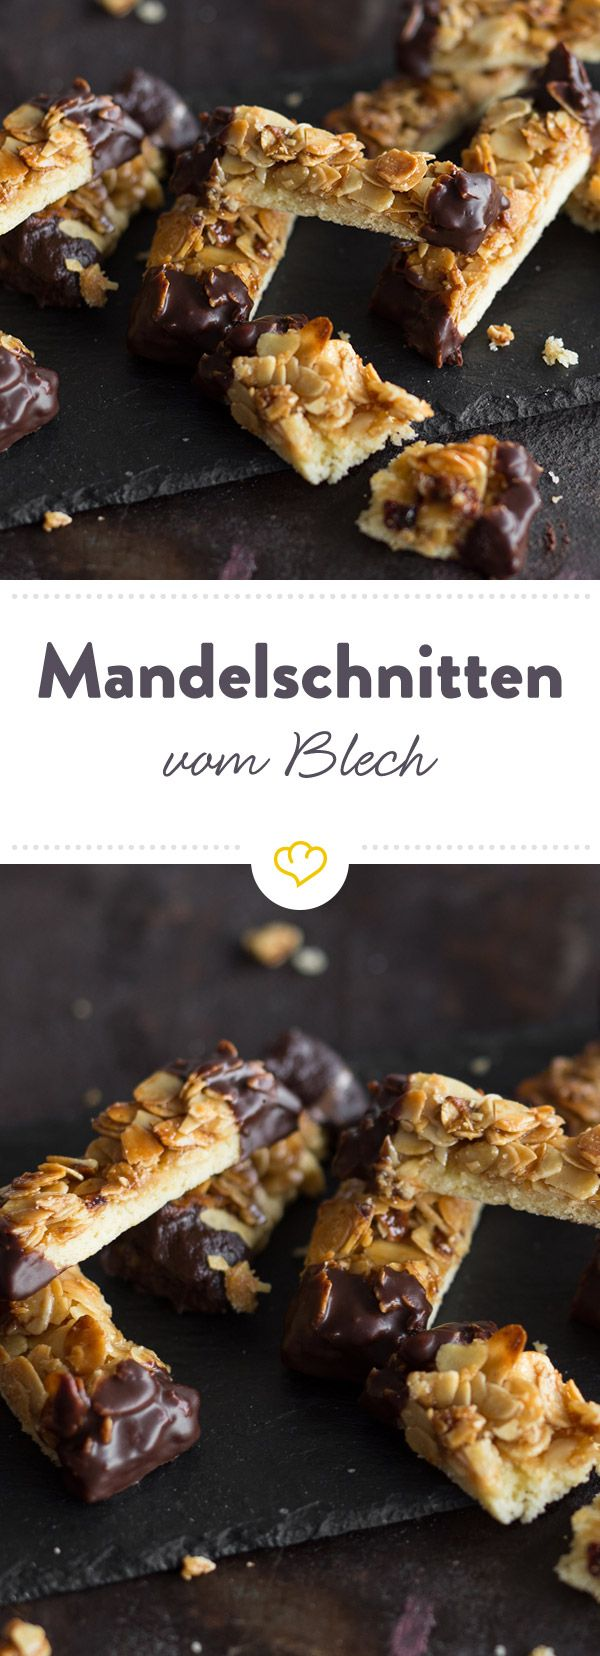 Nussecken 2.0.: Zarte Mandelschnitten #cakesandcheesecakes